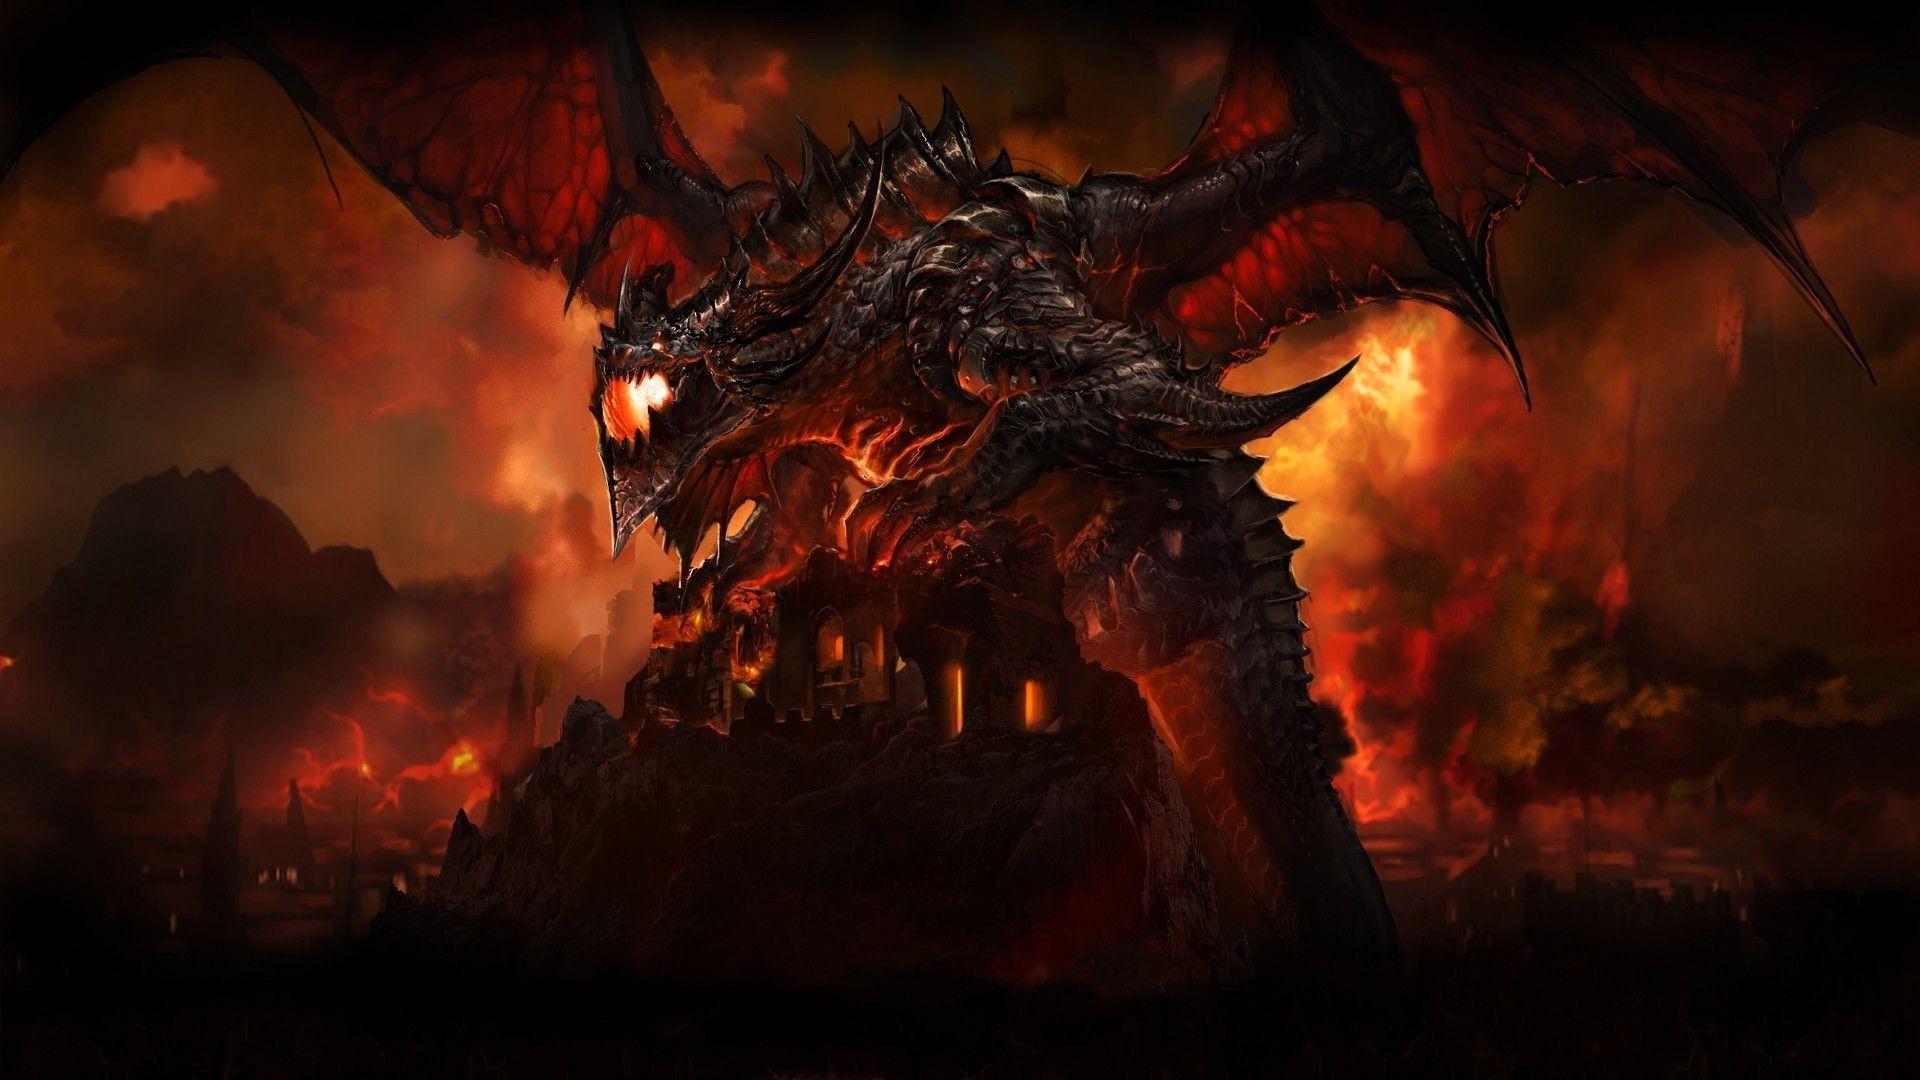 Free Download World Of Warcraft Cataclysm Wallpapers Hd Desktop